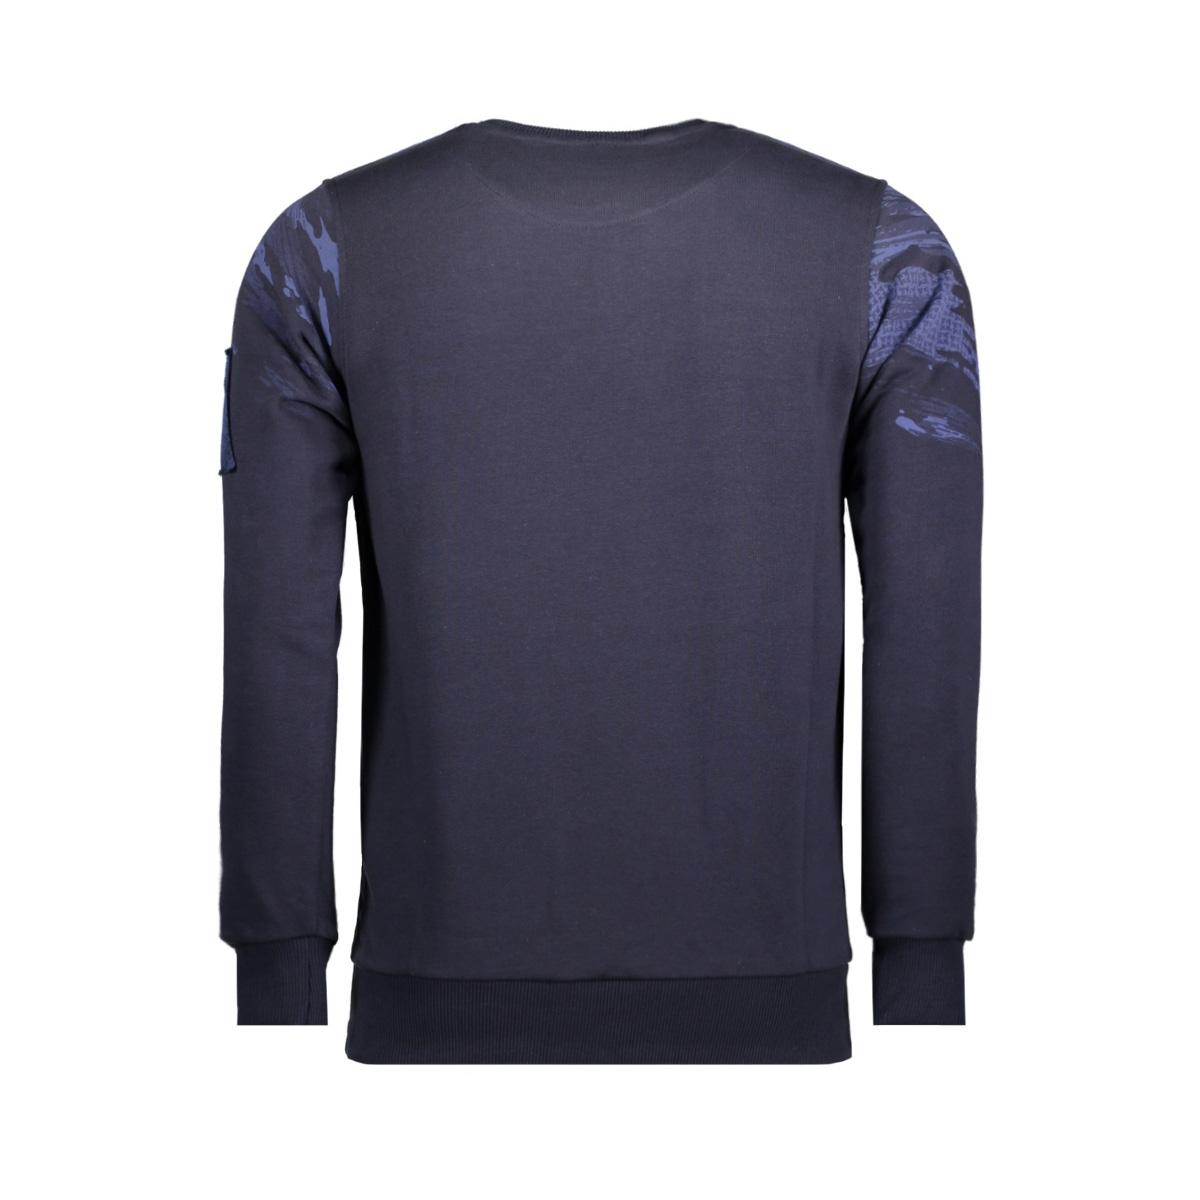 76132 gabbiano sweater navy